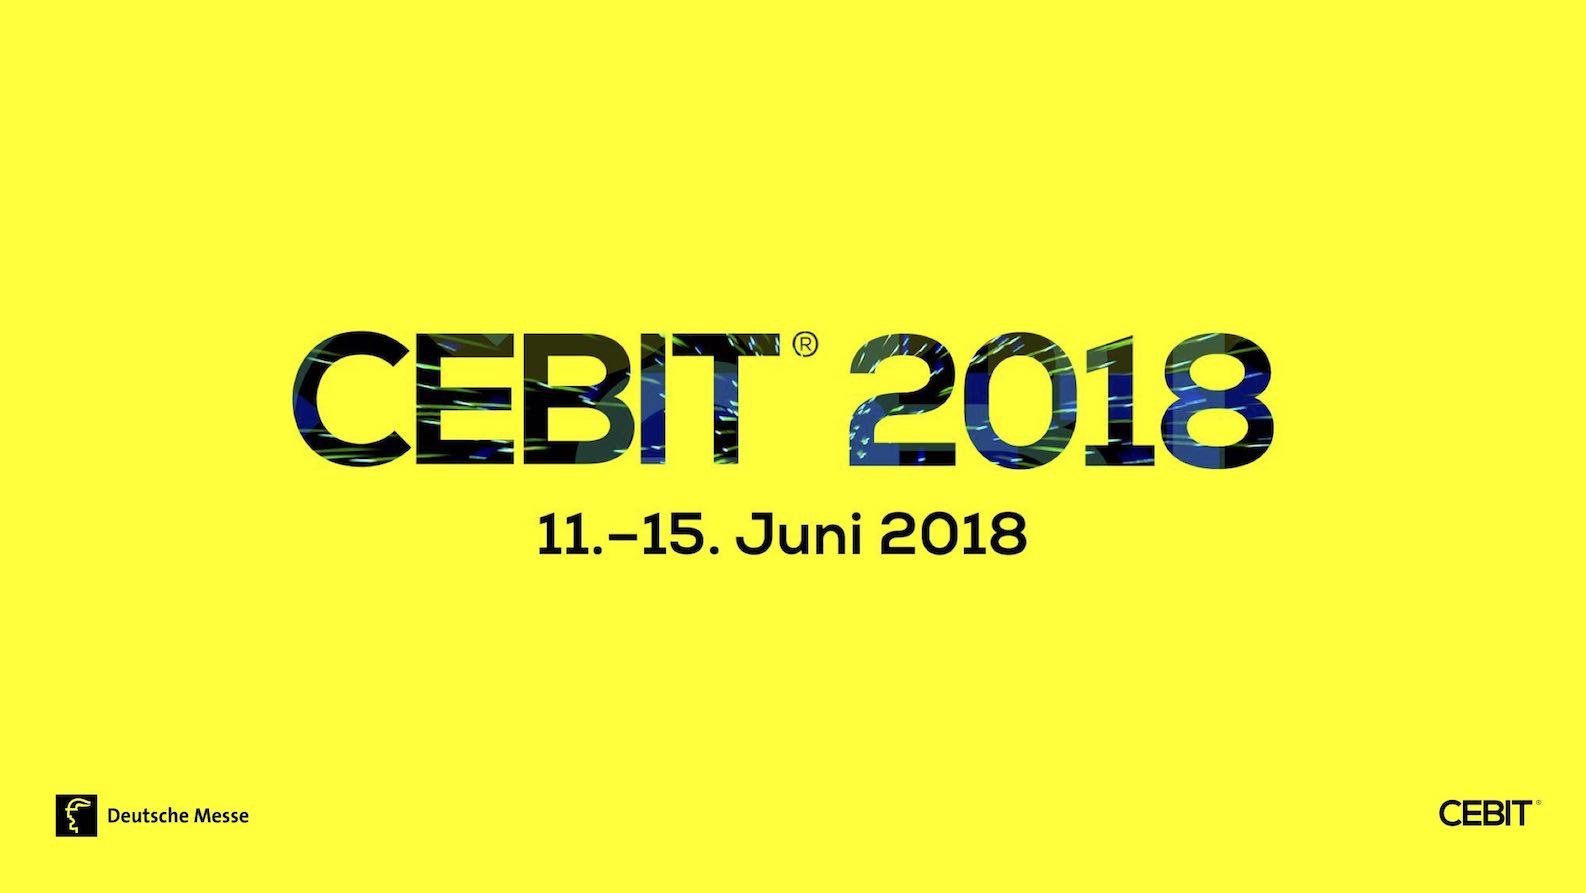 CEBIT_2018_Hannover_Expo_Metropolitan_Monkey